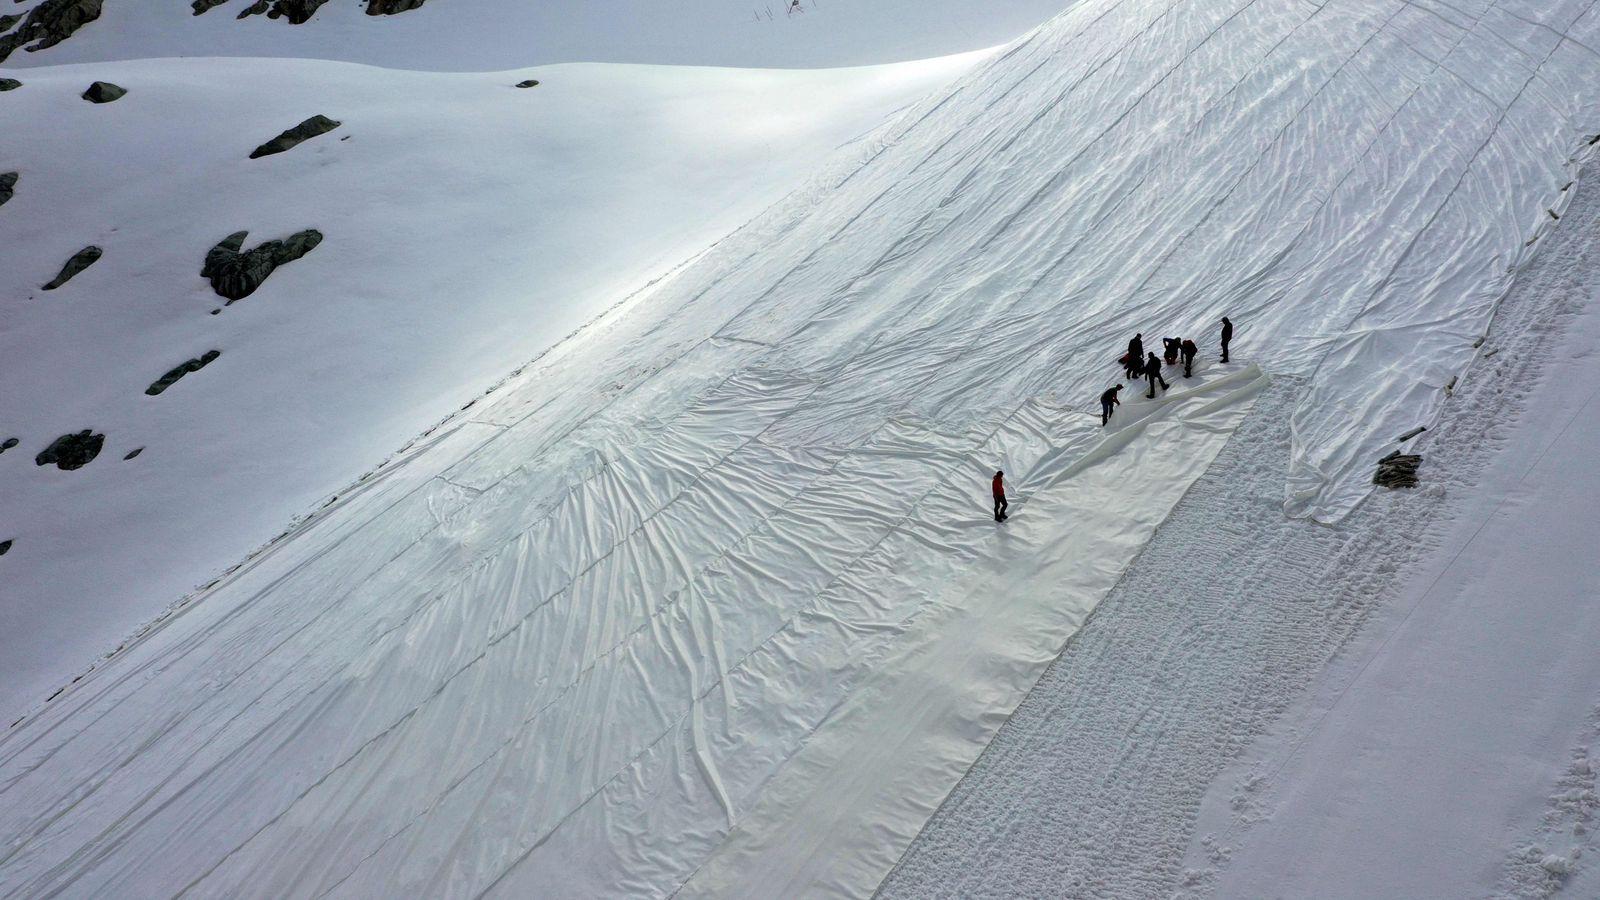 ITALY-MOUNTAIN-ENVIRONMENT-GLACIER-SKIING-MELTING